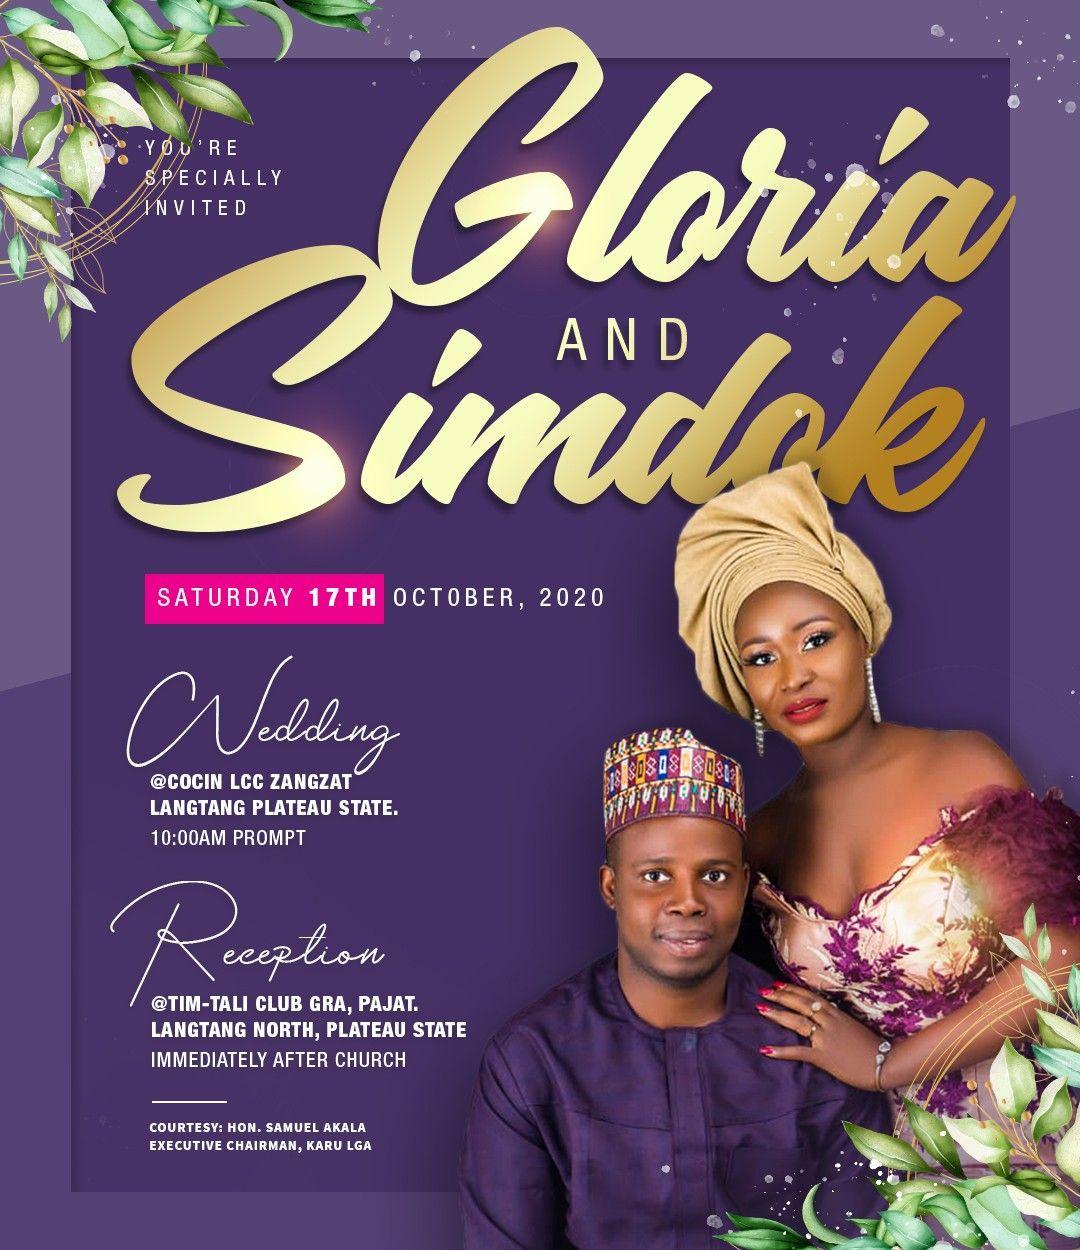 Gloria Simdok Wedding Banner Design Event Poster Design Inspiration Event Poster Design